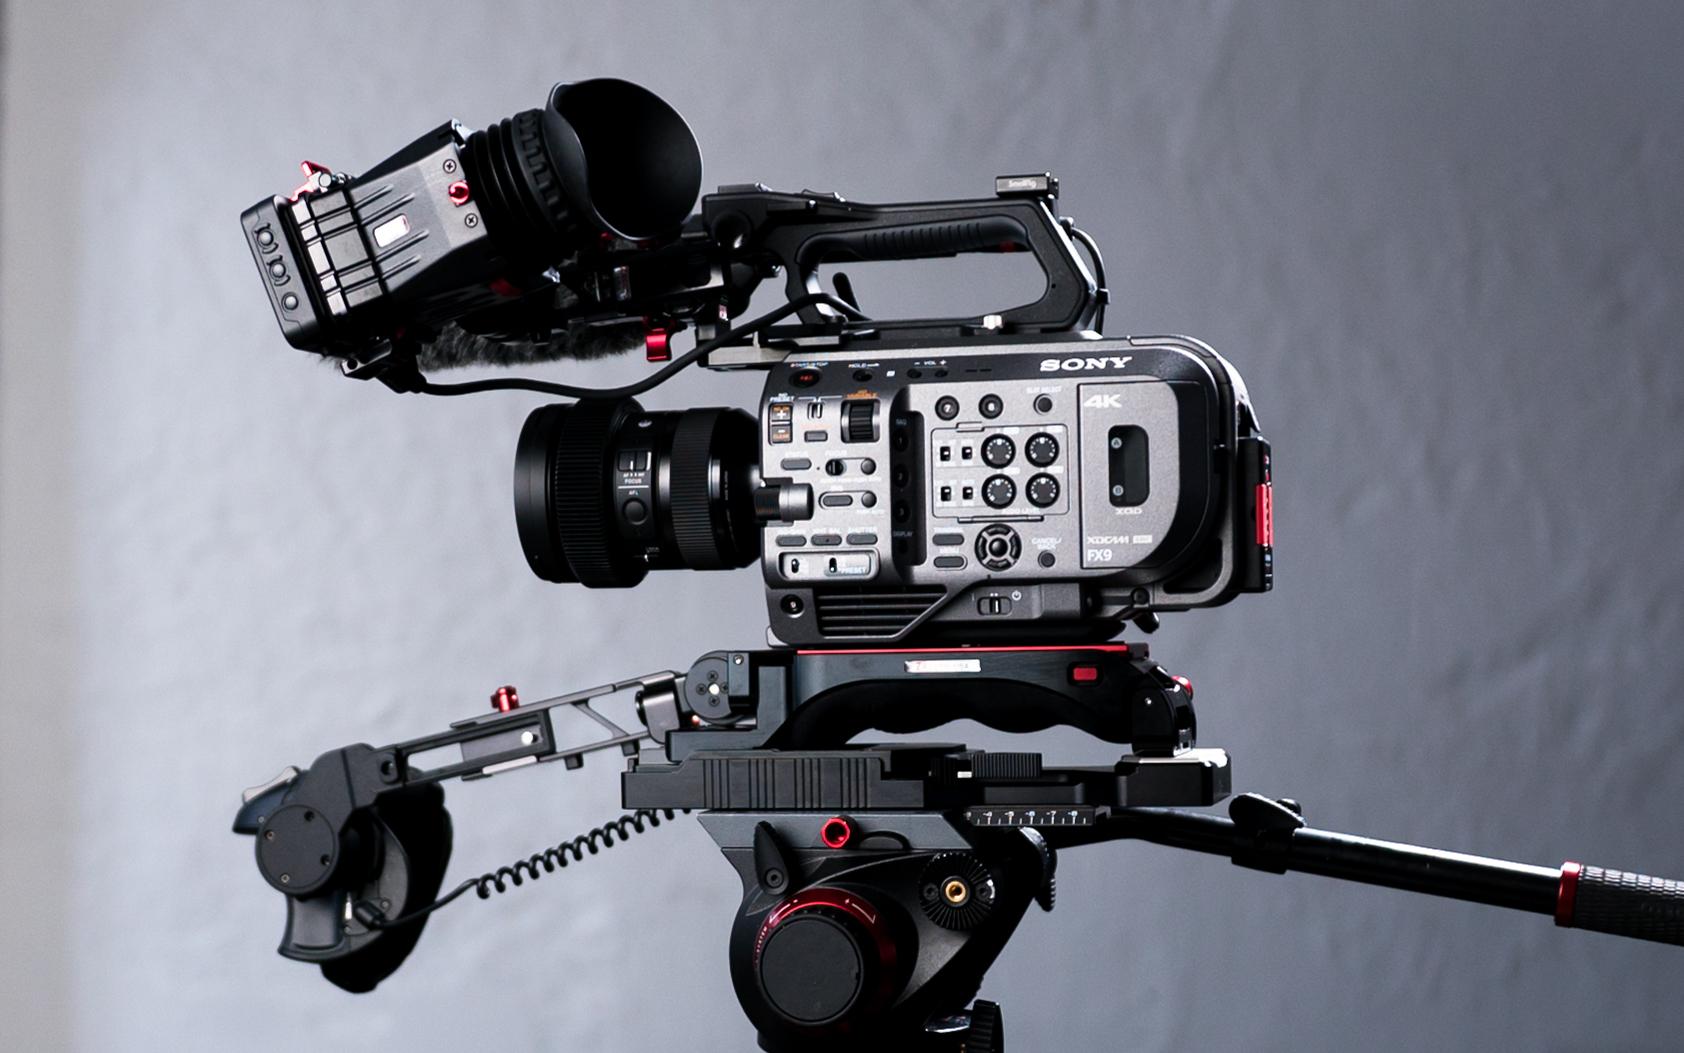 Sony-FX9-bilder-bryng-film-2-2021-02466-